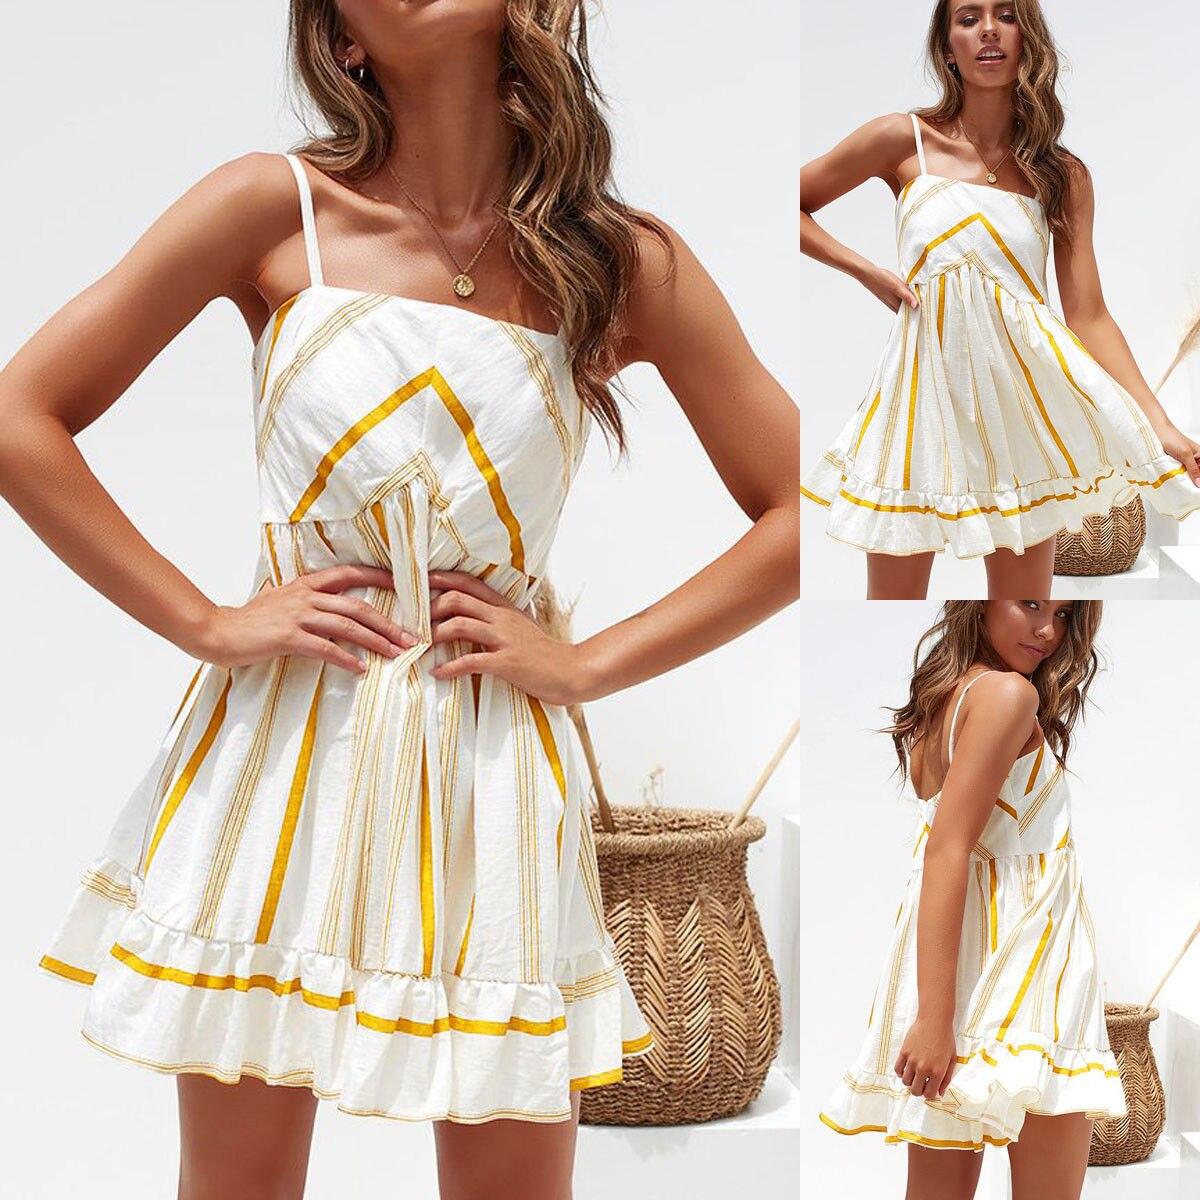 Skirts 2020 New brand Womens Sexy Spaghetti Strap striped Casual  Sleeveless Evening Party  Club Club Short Mini Skirts